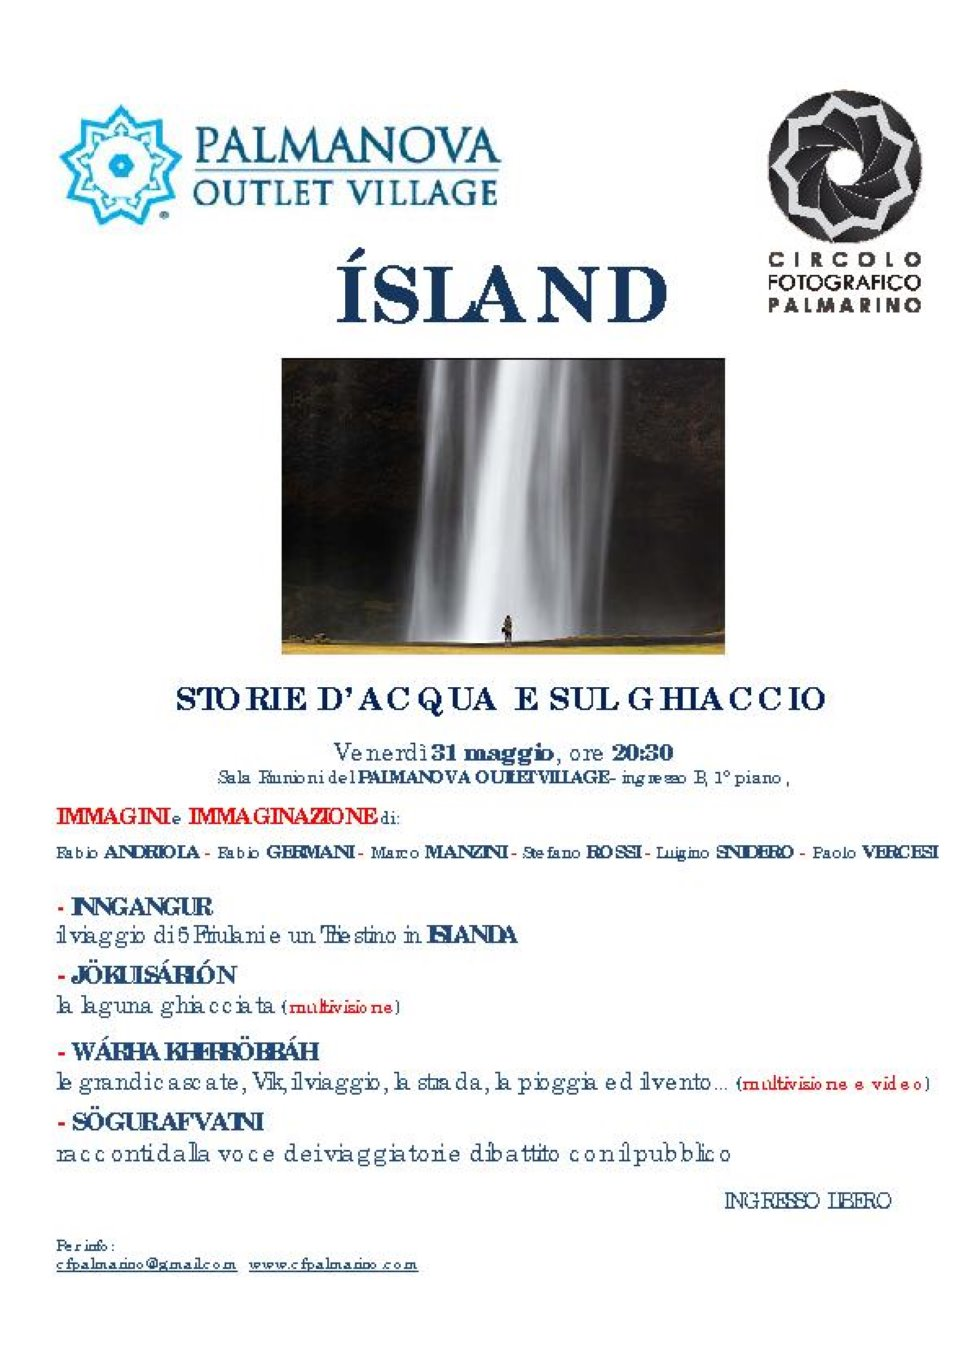 ÍSLAND - STORIE D'ACQUA E SUL GHIACCIO